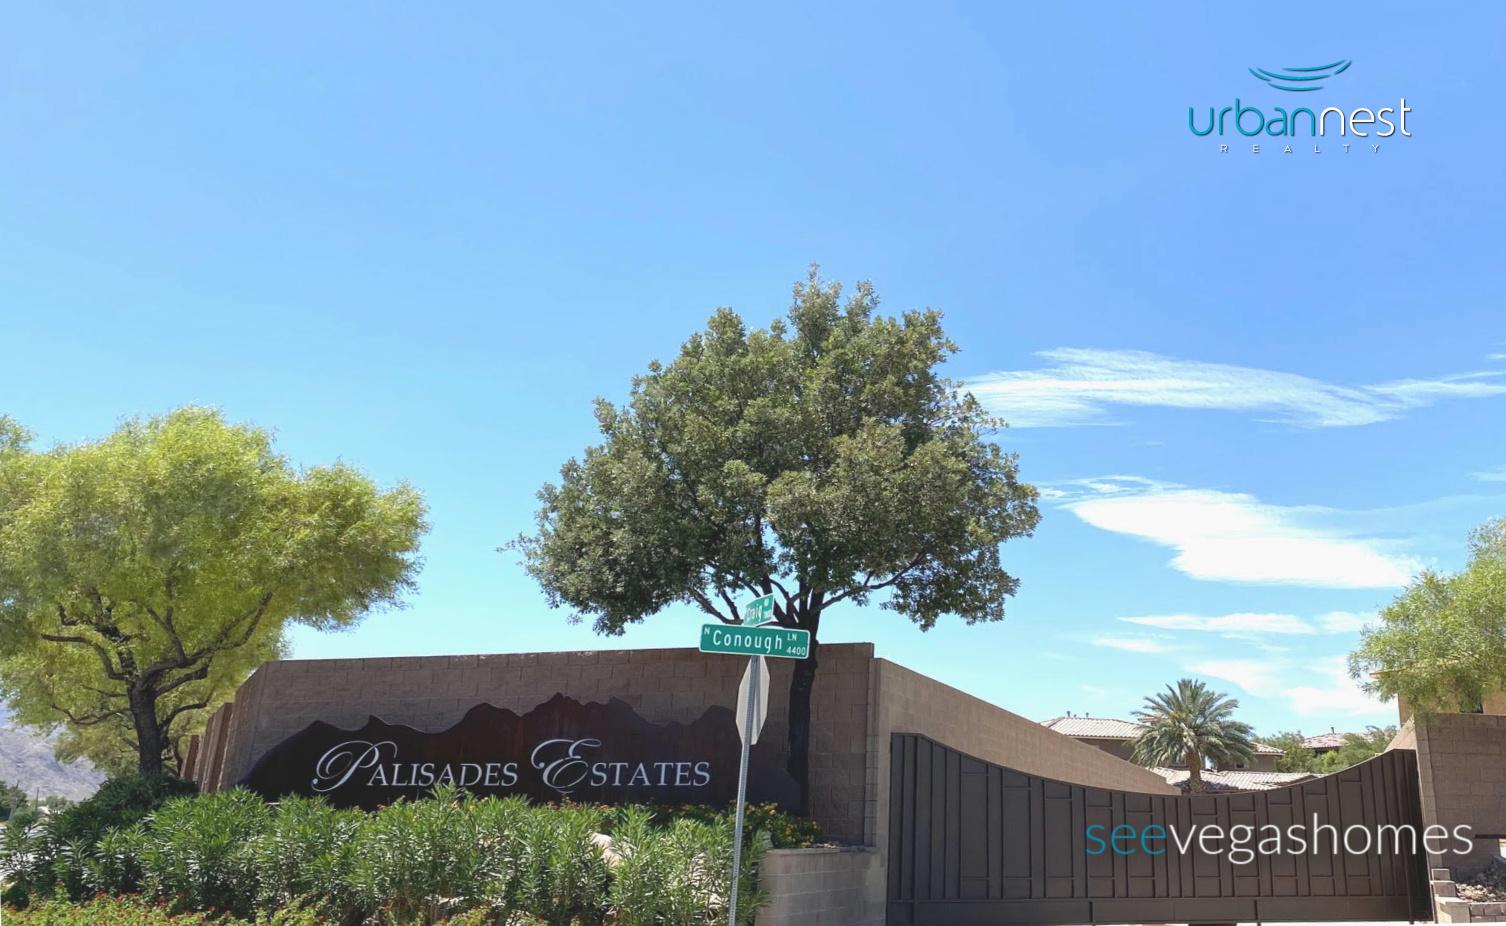 Palisades_Estates_Las_Vegas_NV_89129_SeeVegasHomes